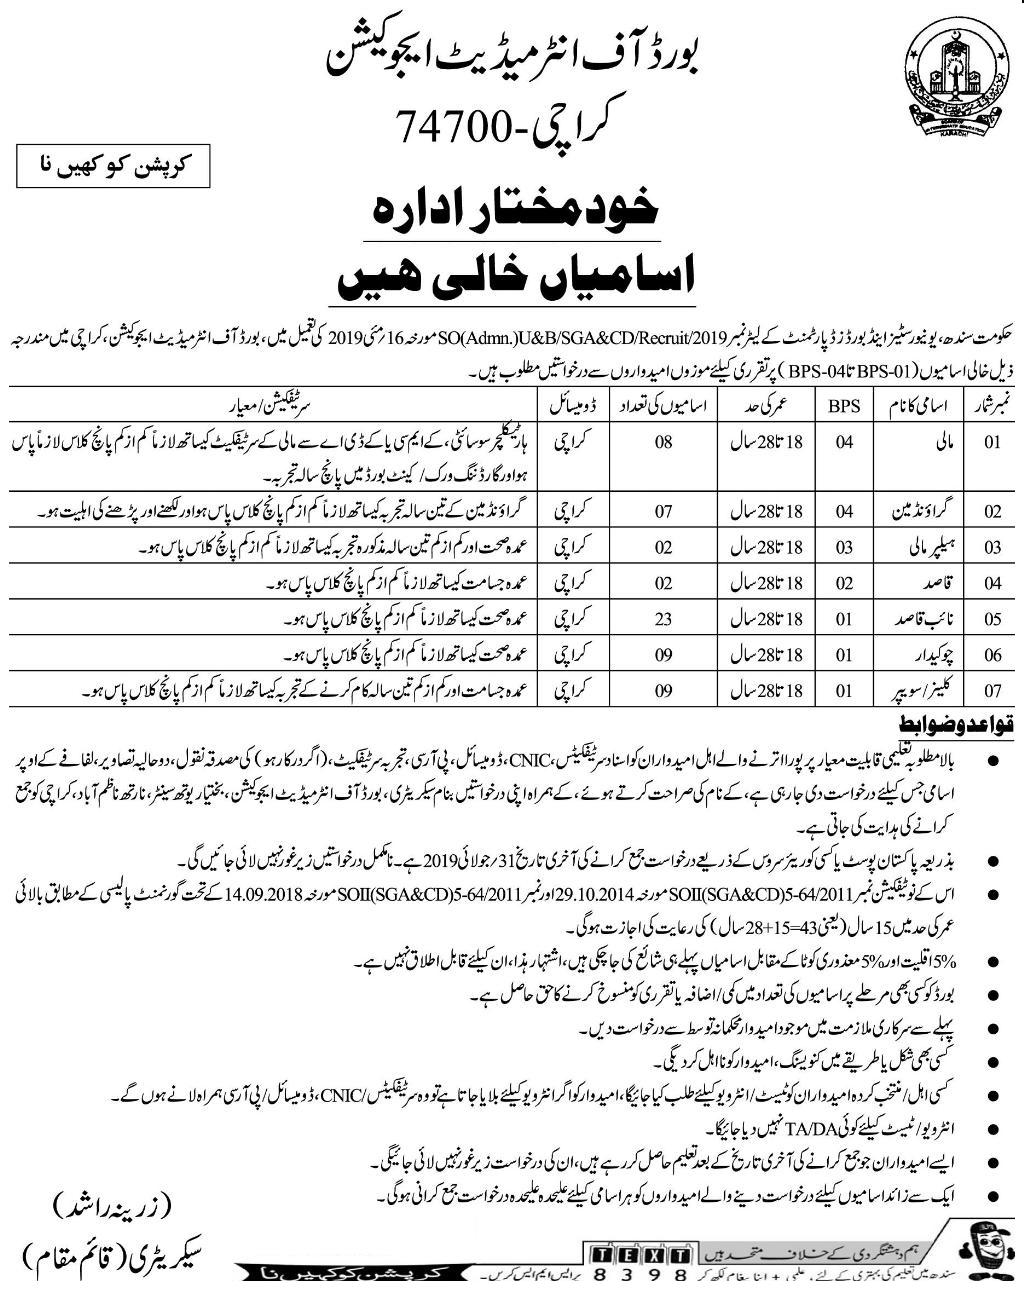 Board Of Intermediate And Education Karachi Jobs 2019